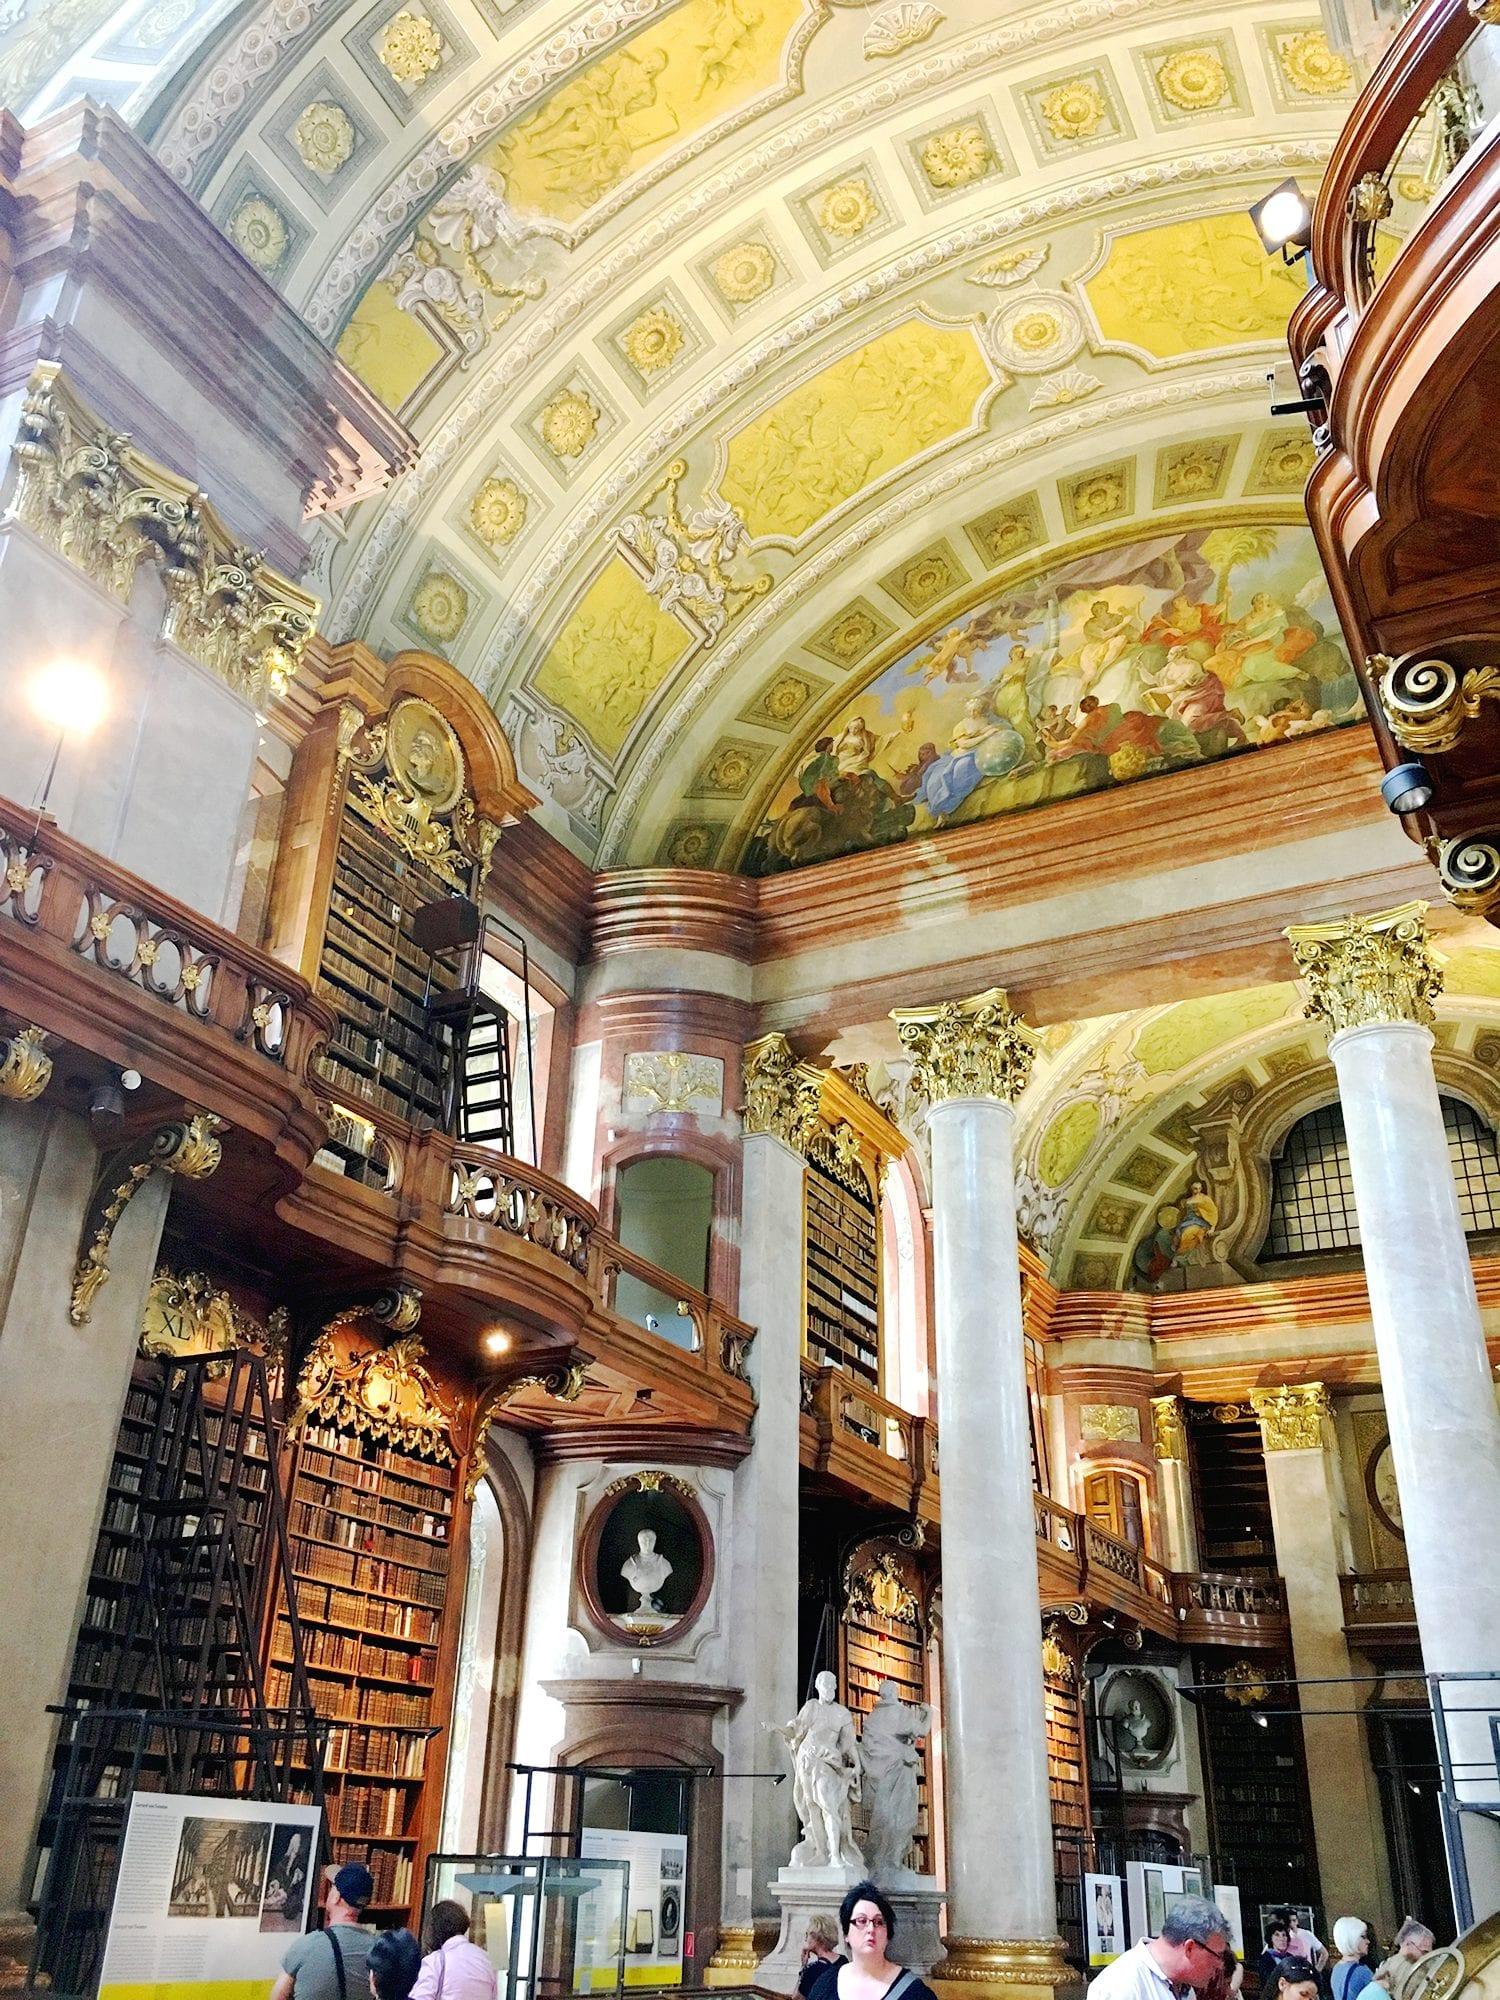 Austrian National Library Entrance Fee